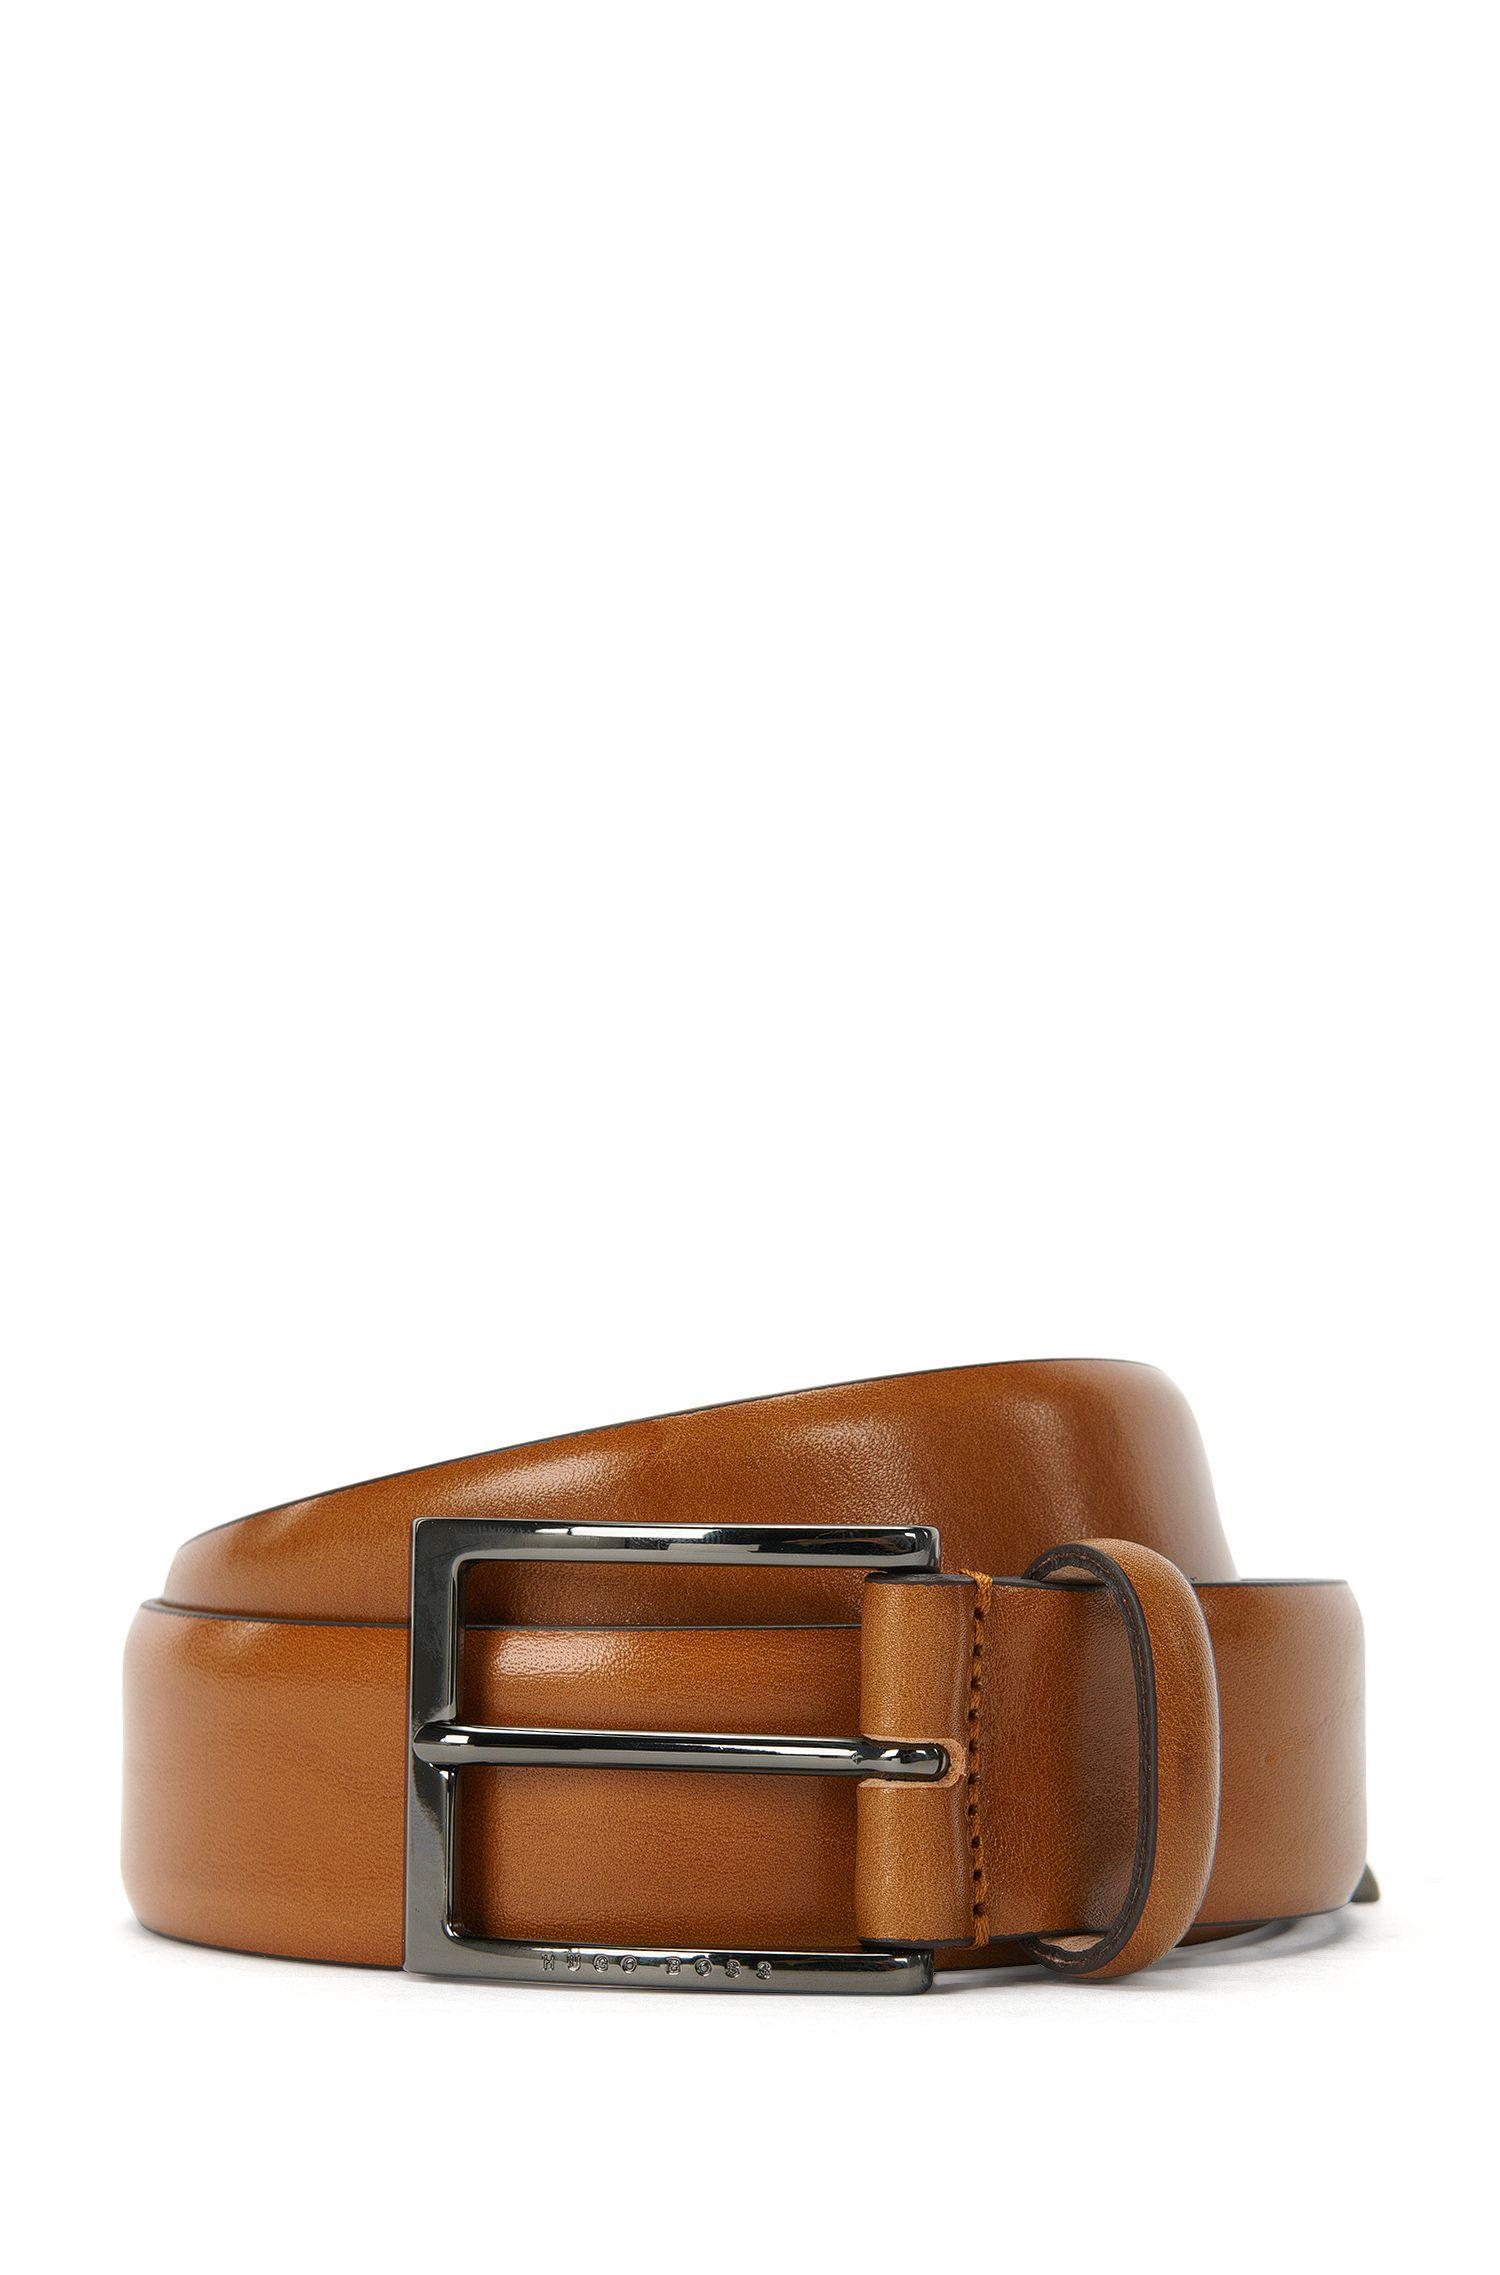 Cintura bicolore in pelle conciata al vegetale by BOSS Tailored